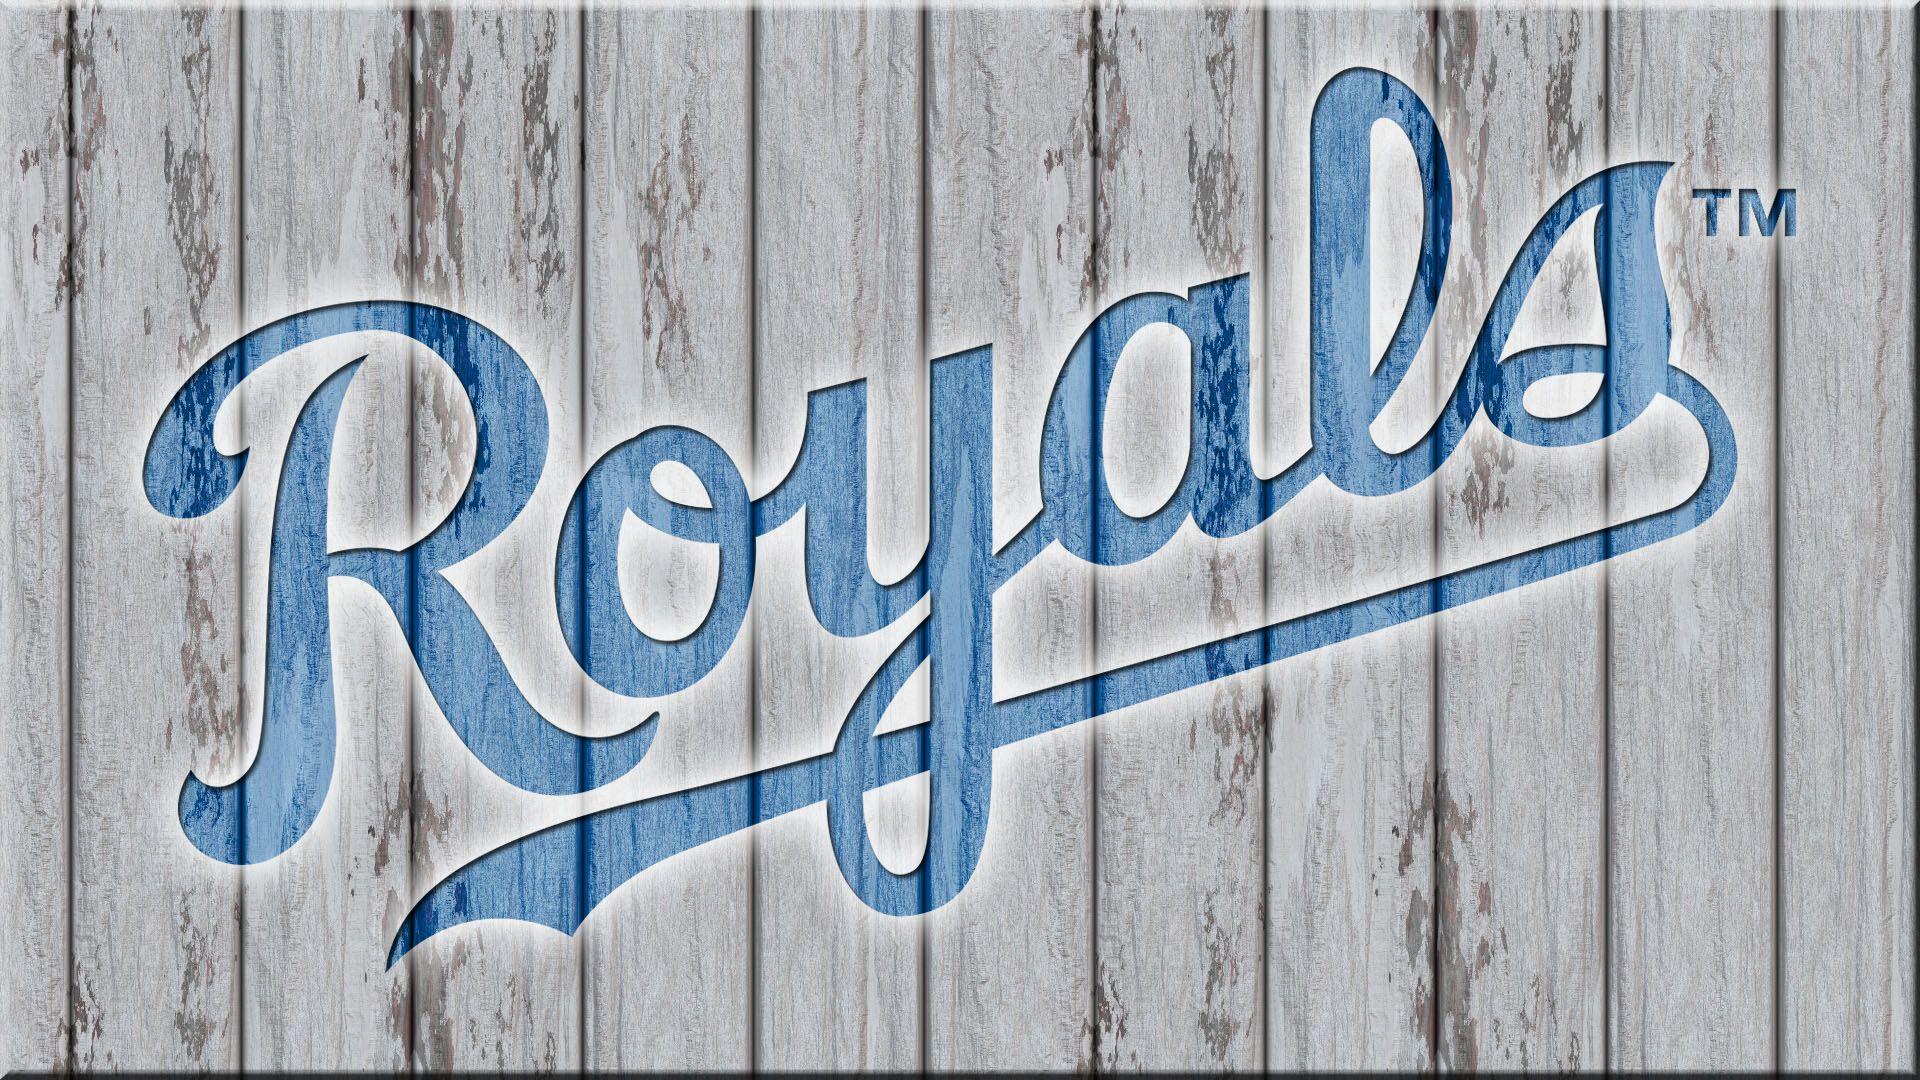 Kc Royals Wallpaper Lock Screen Kansas City Royals Baseball Kansas City Royals Crafts Royal Wallpaper